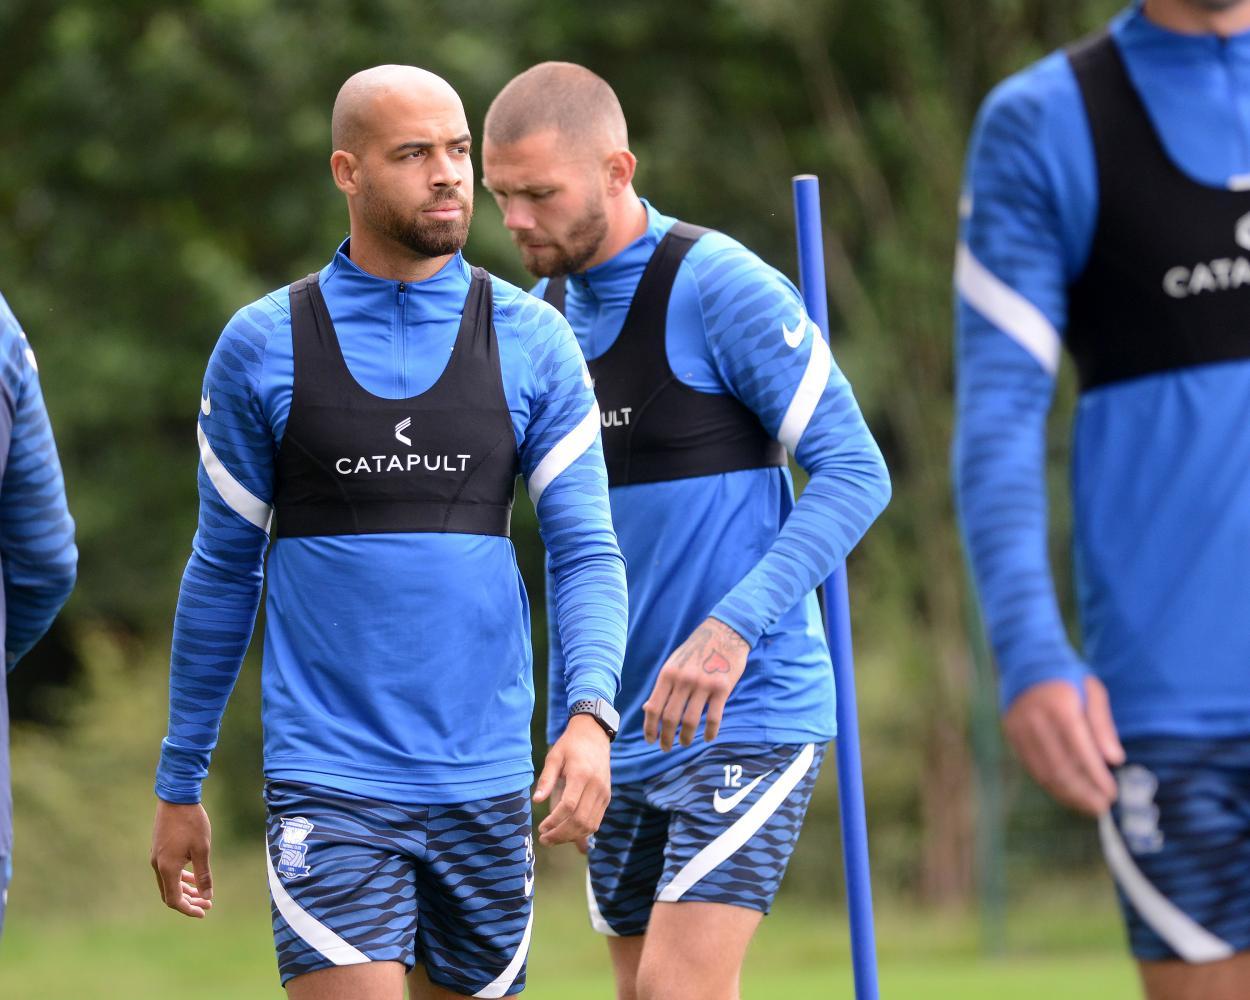 Birmingham City training photo // Source: Birmingham City